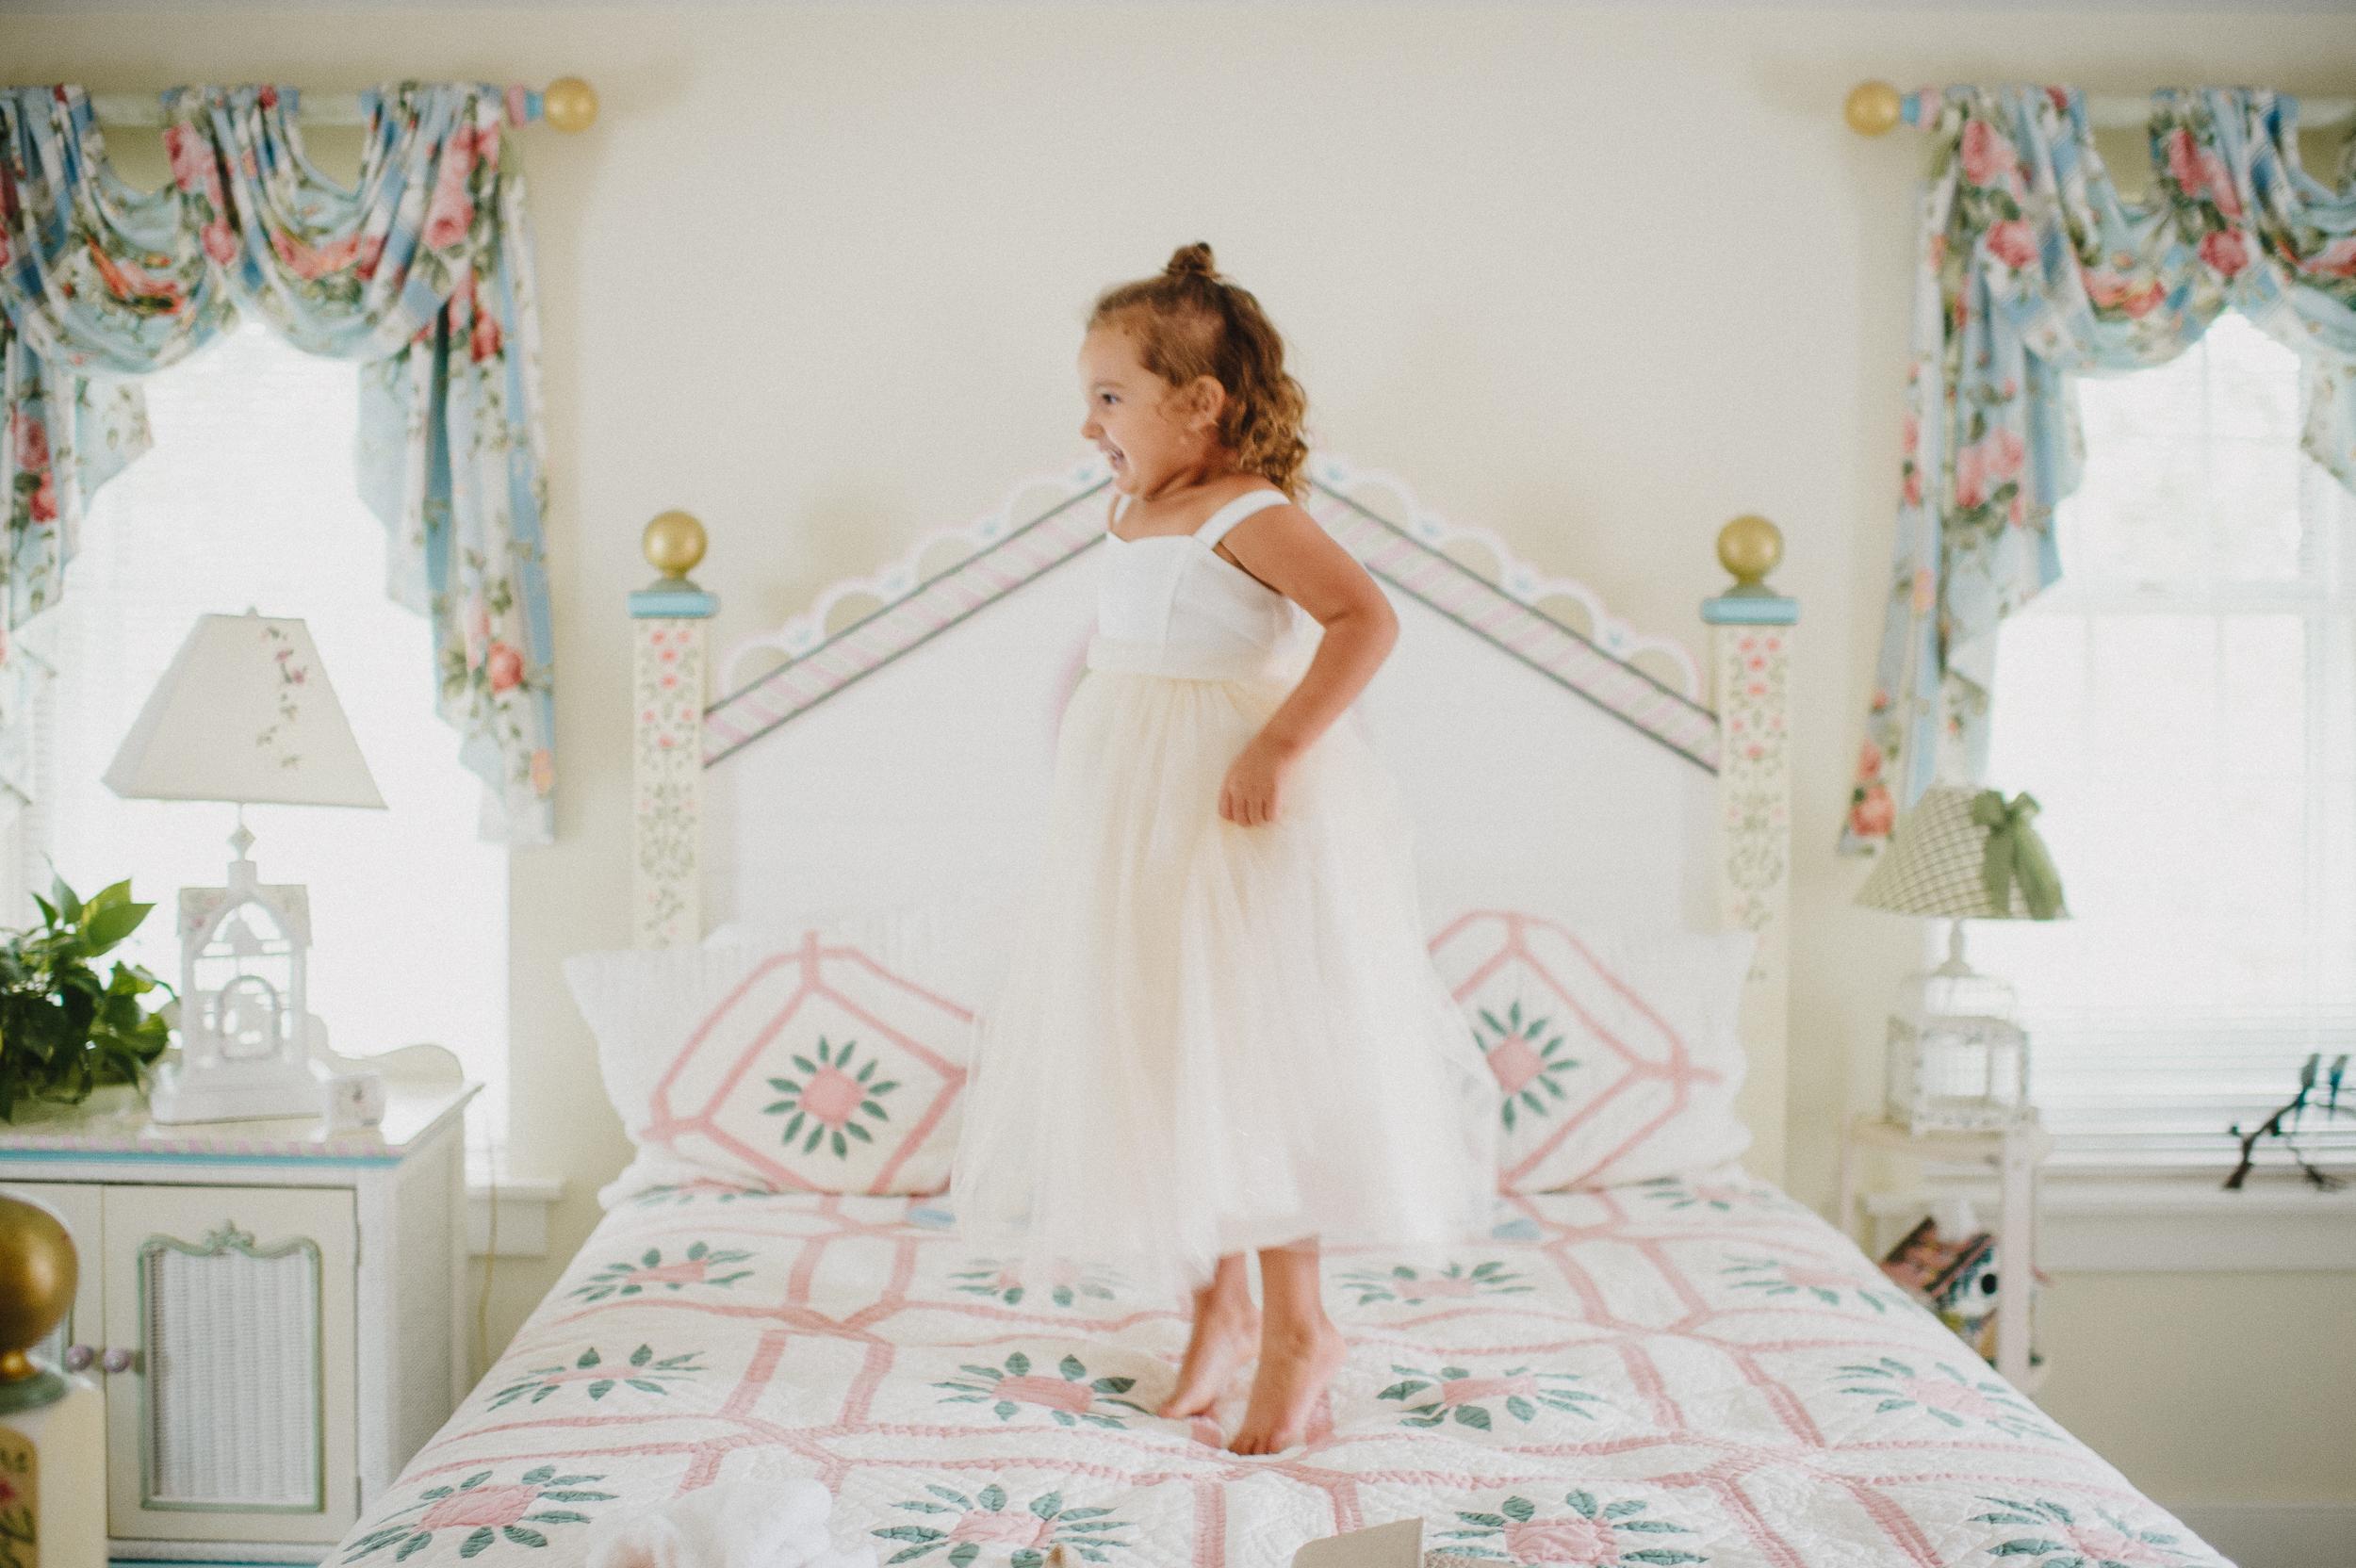 delaware-estate-wedding-photographer-pat-robinson-photography-22.jpg